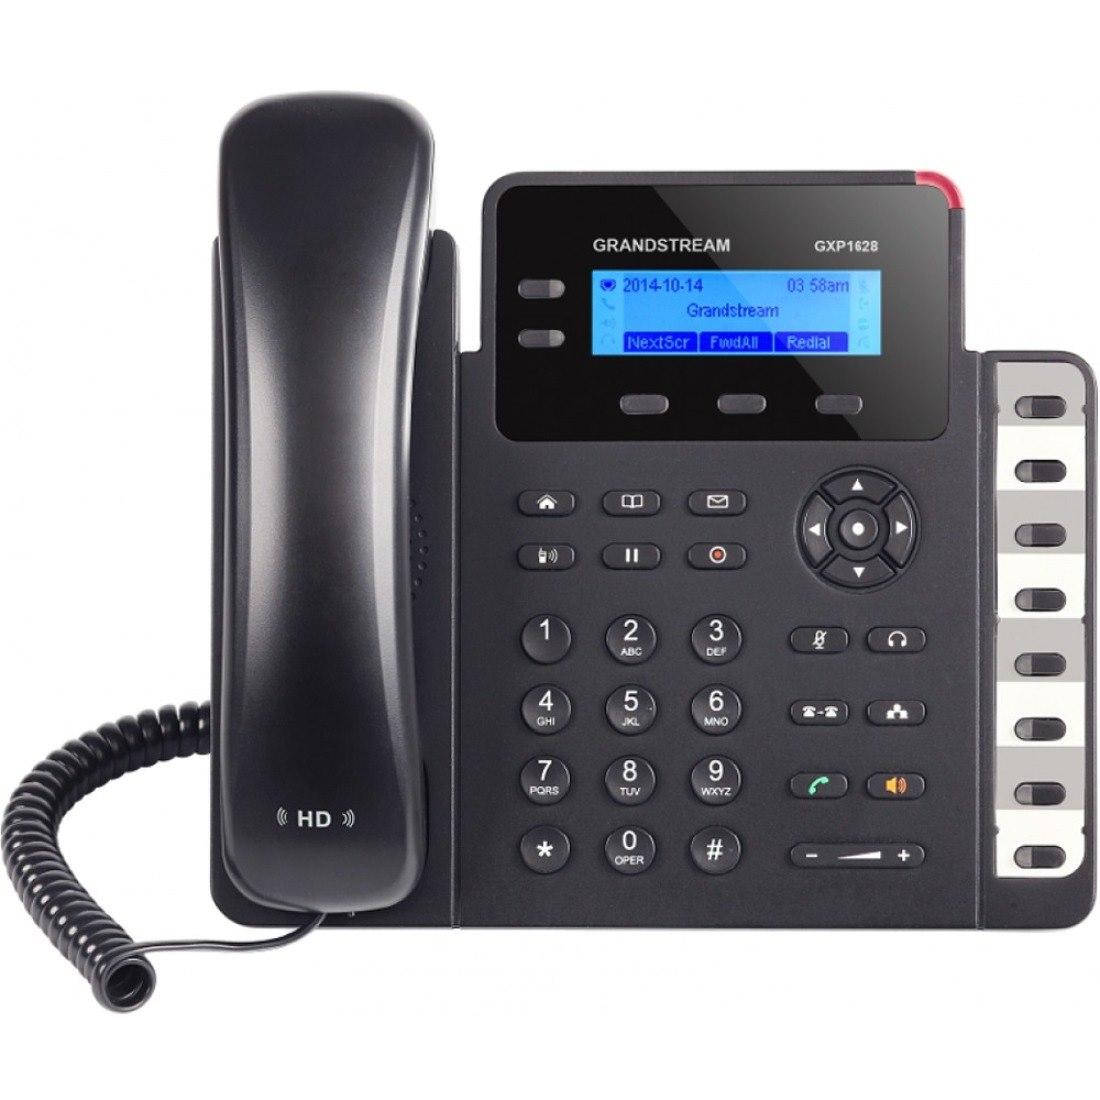 Grandstream GXP1628 IP Phone - Wall Mountable